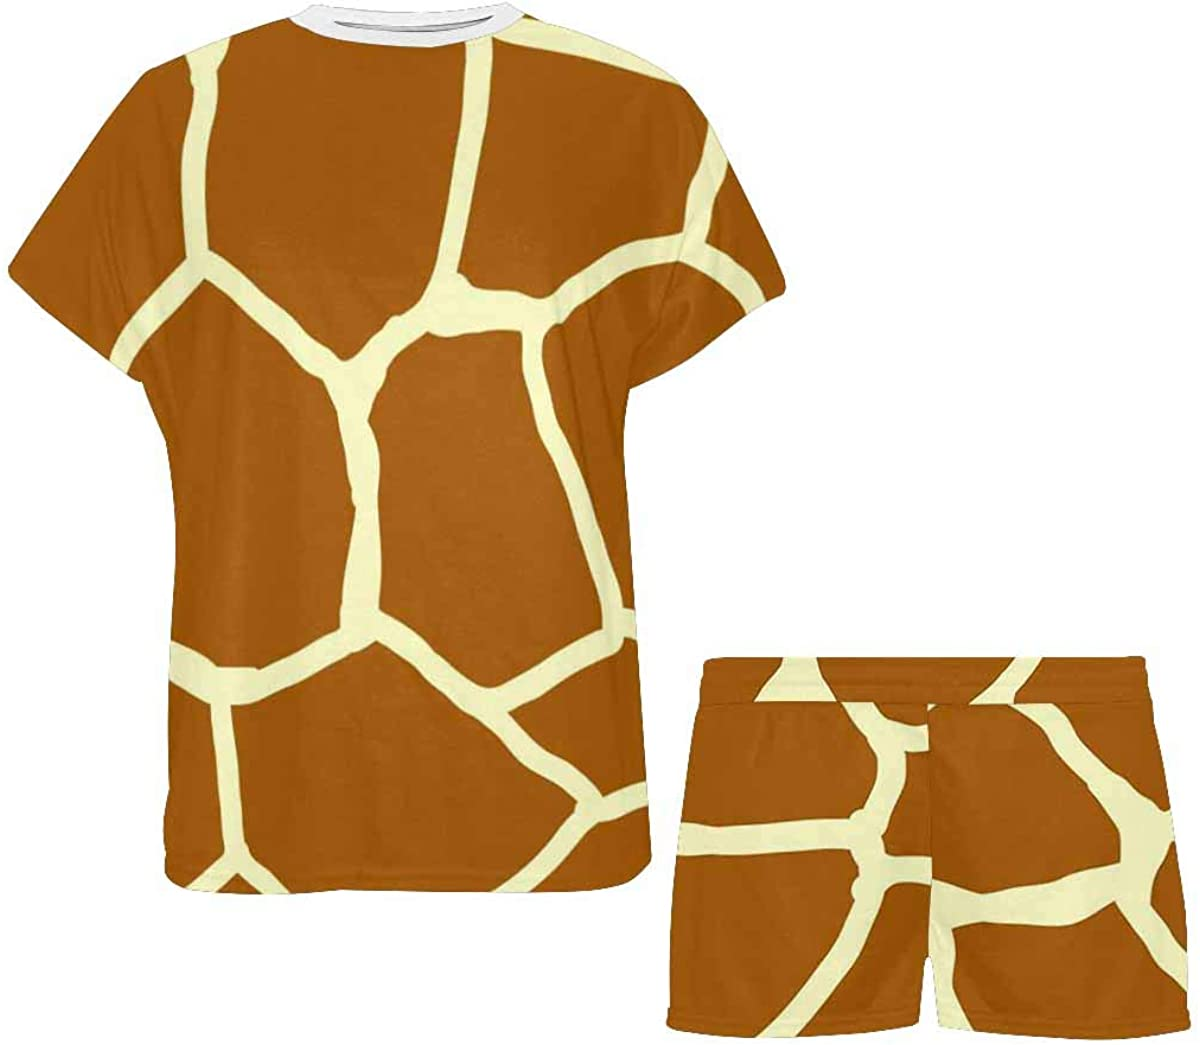 INTERESTPRINT Giraffe Pattern Women's Breathable 2 Piece Shorts Pajama Sleepwear Set